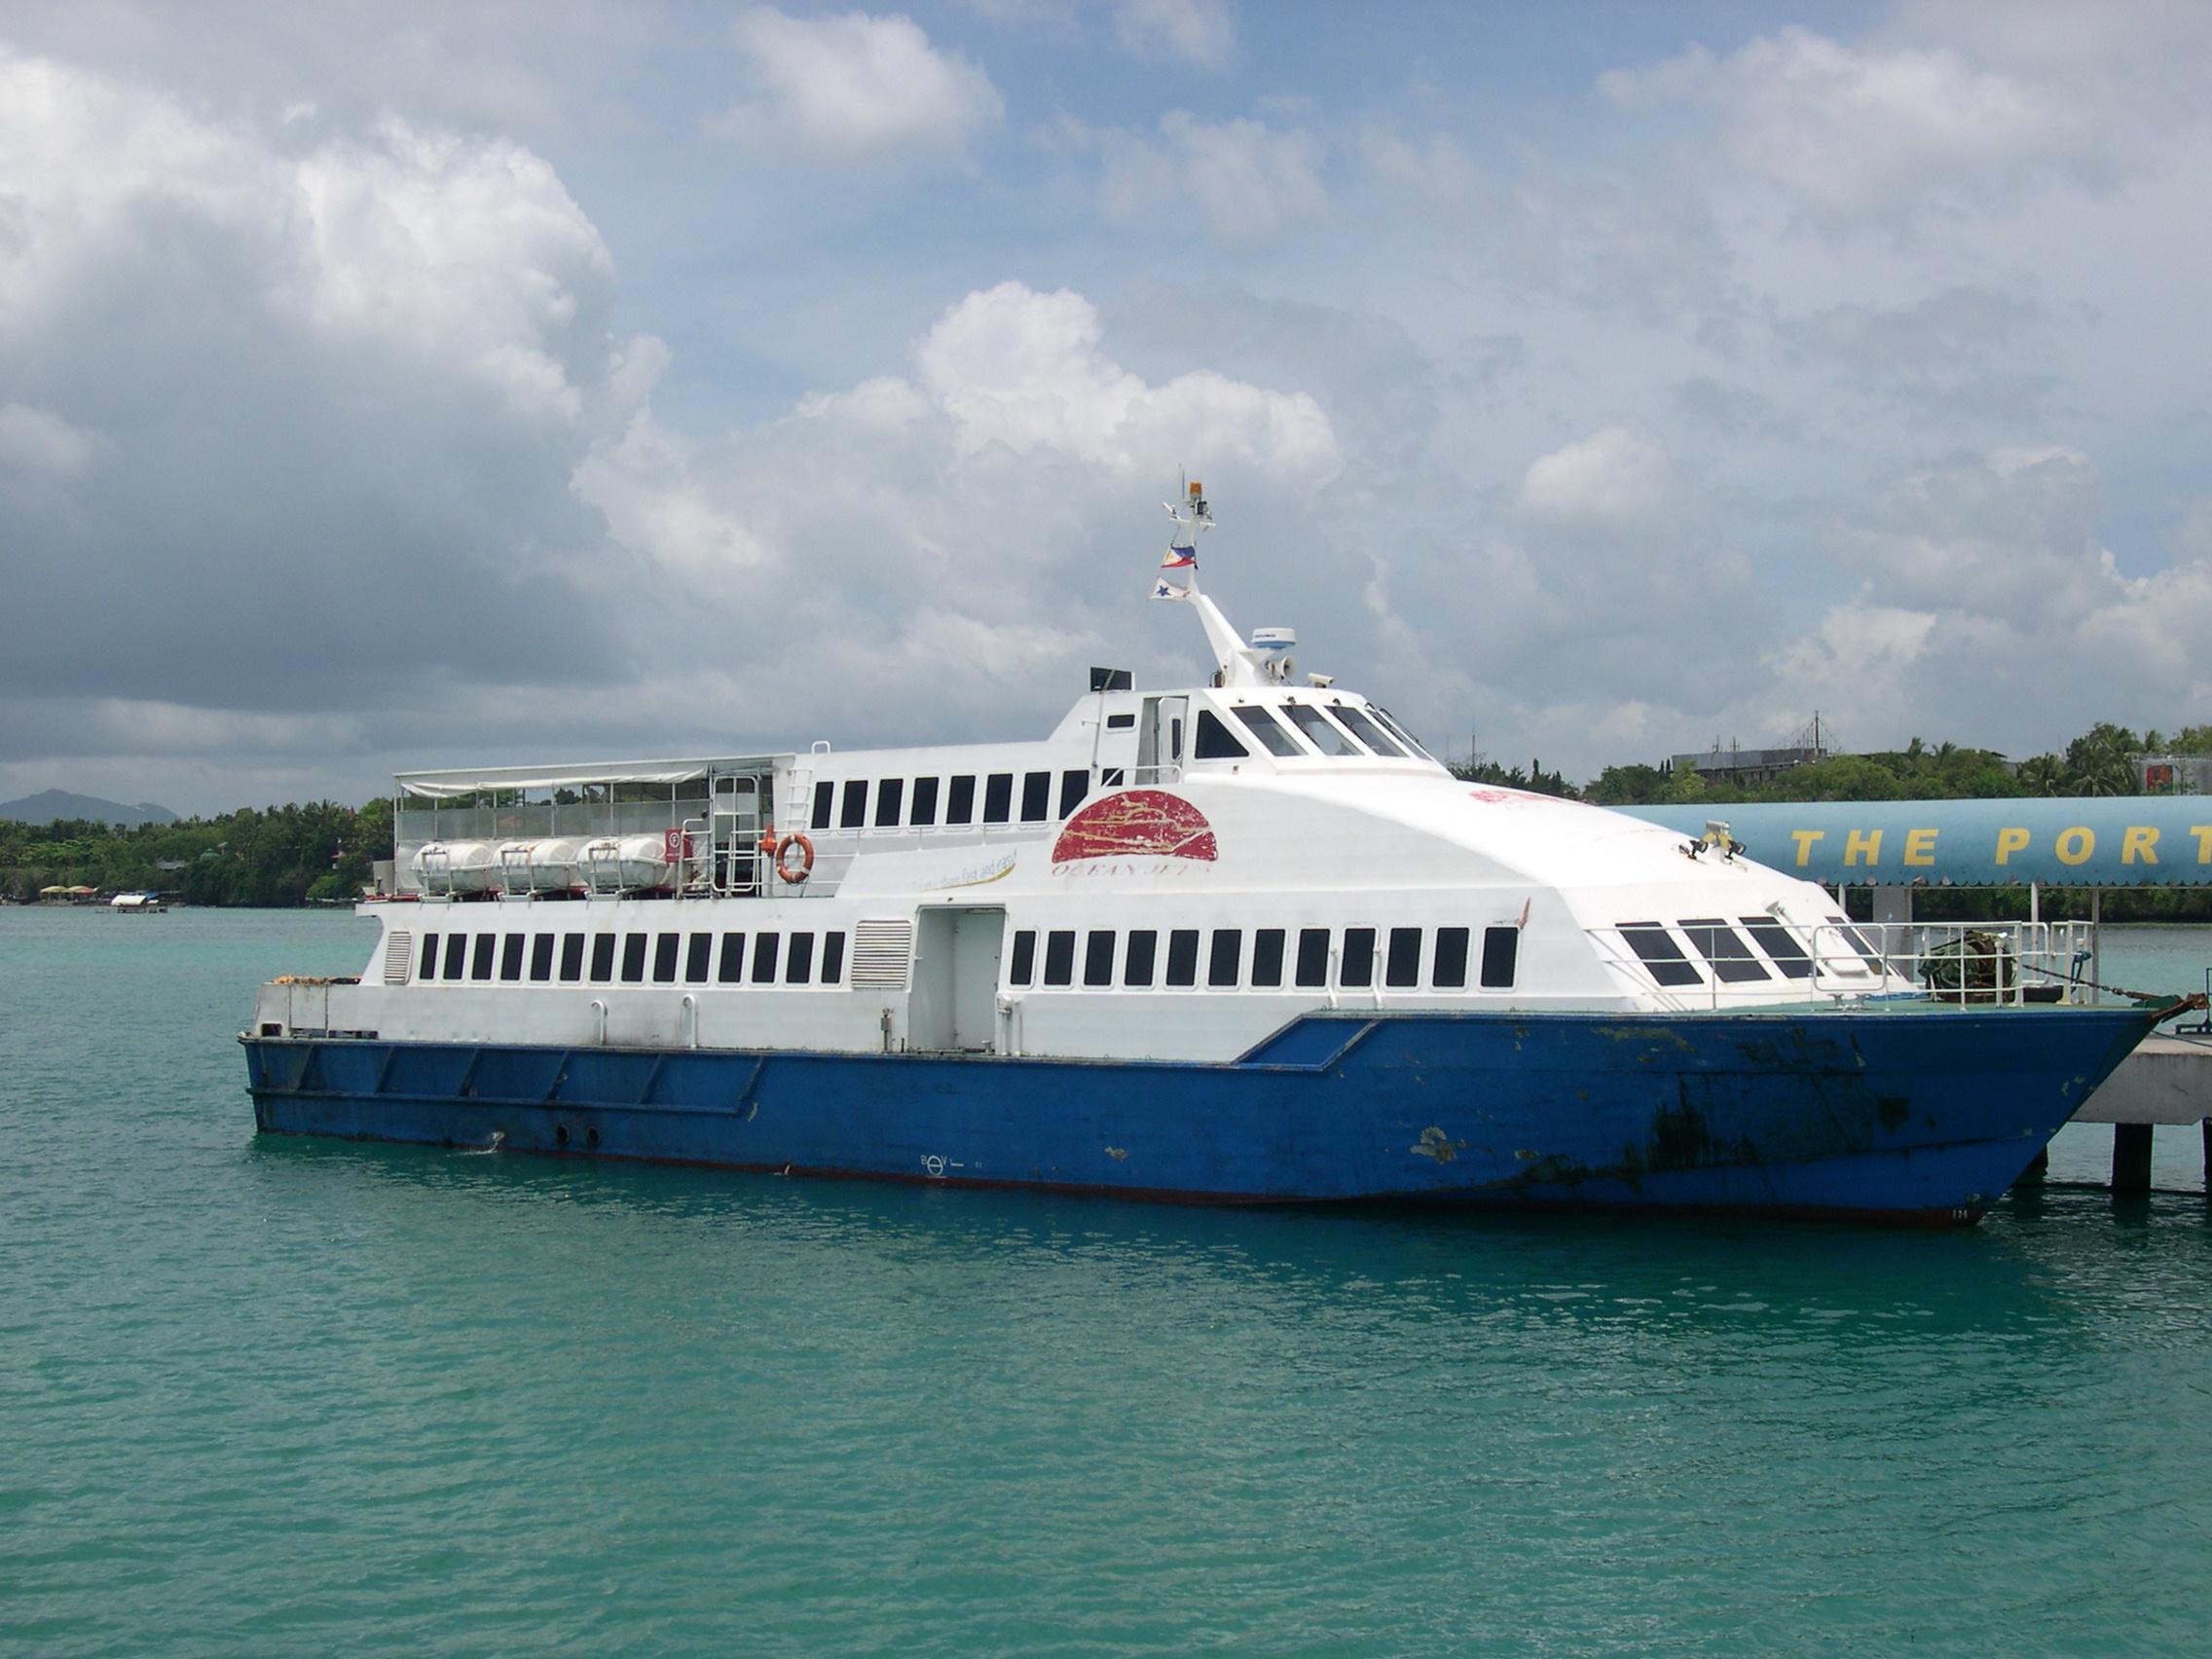 File:Ferry Boat Tagbilaran.jpg - Wikimedia Commons